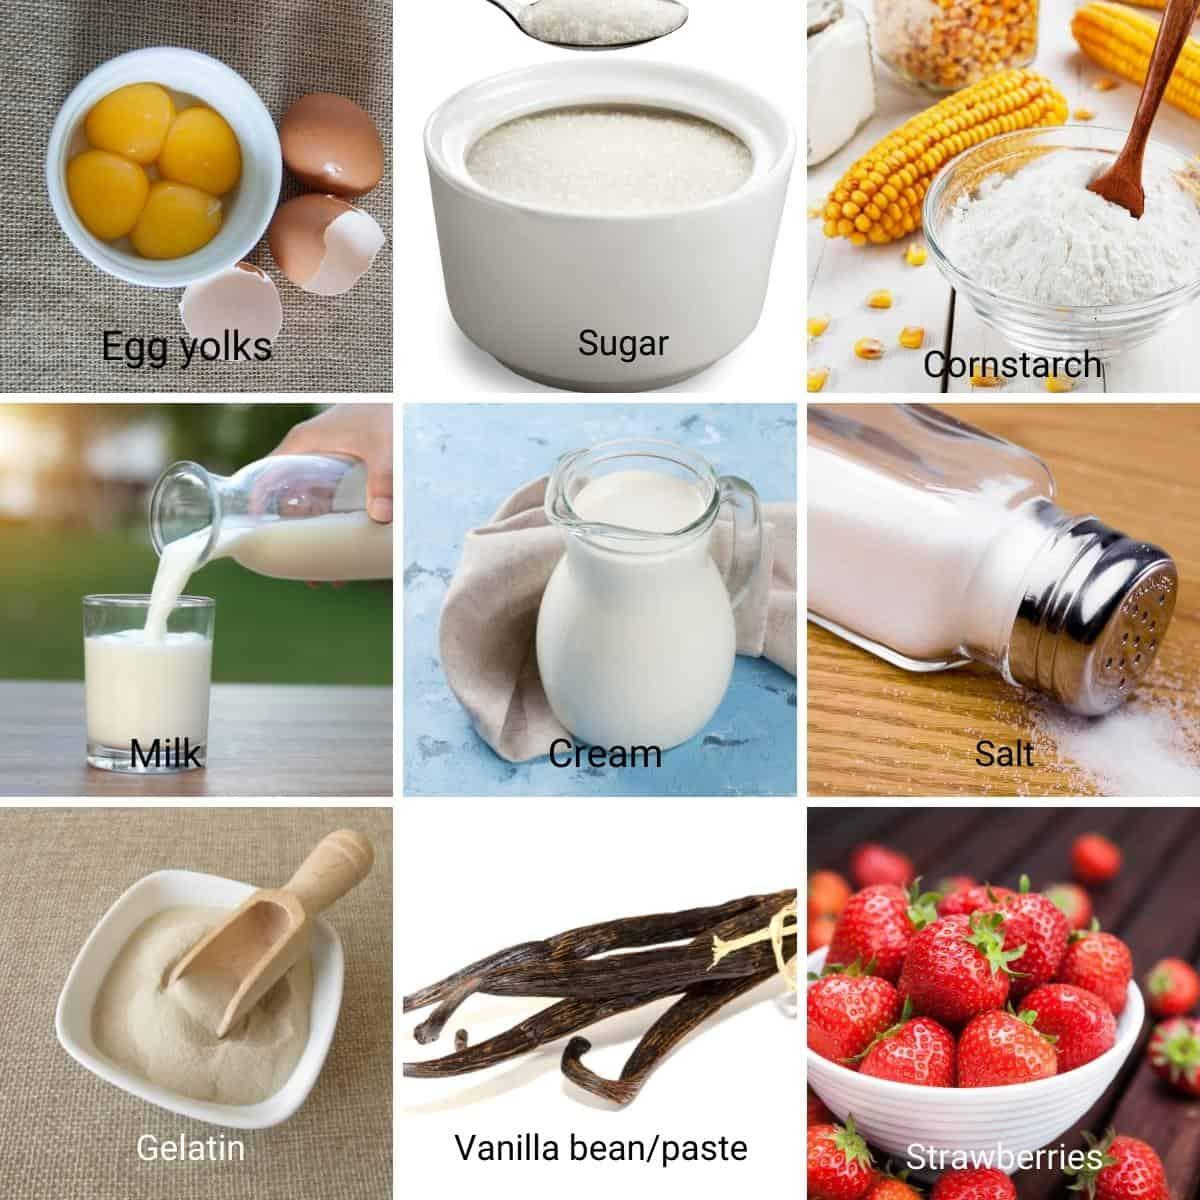 Ingredients for strawberry Bavarian cream